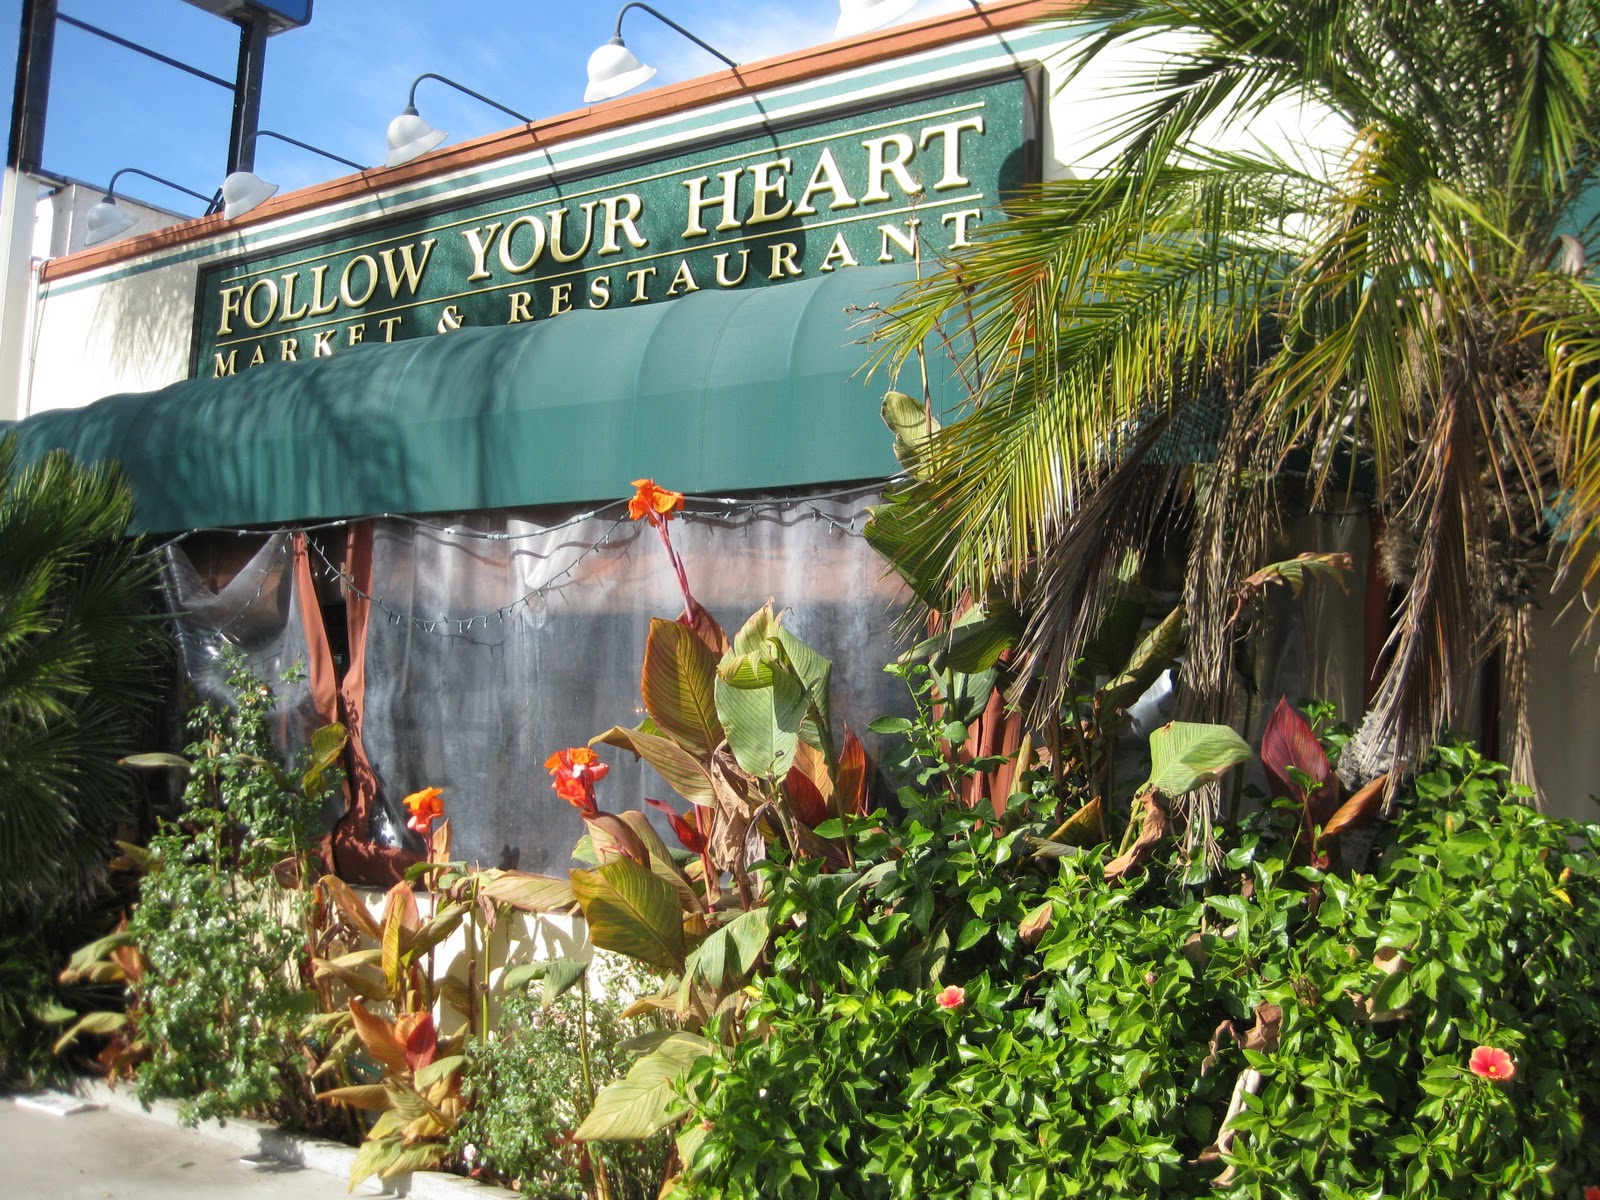 follow-your-heart vegan passerbuys LA.jpg